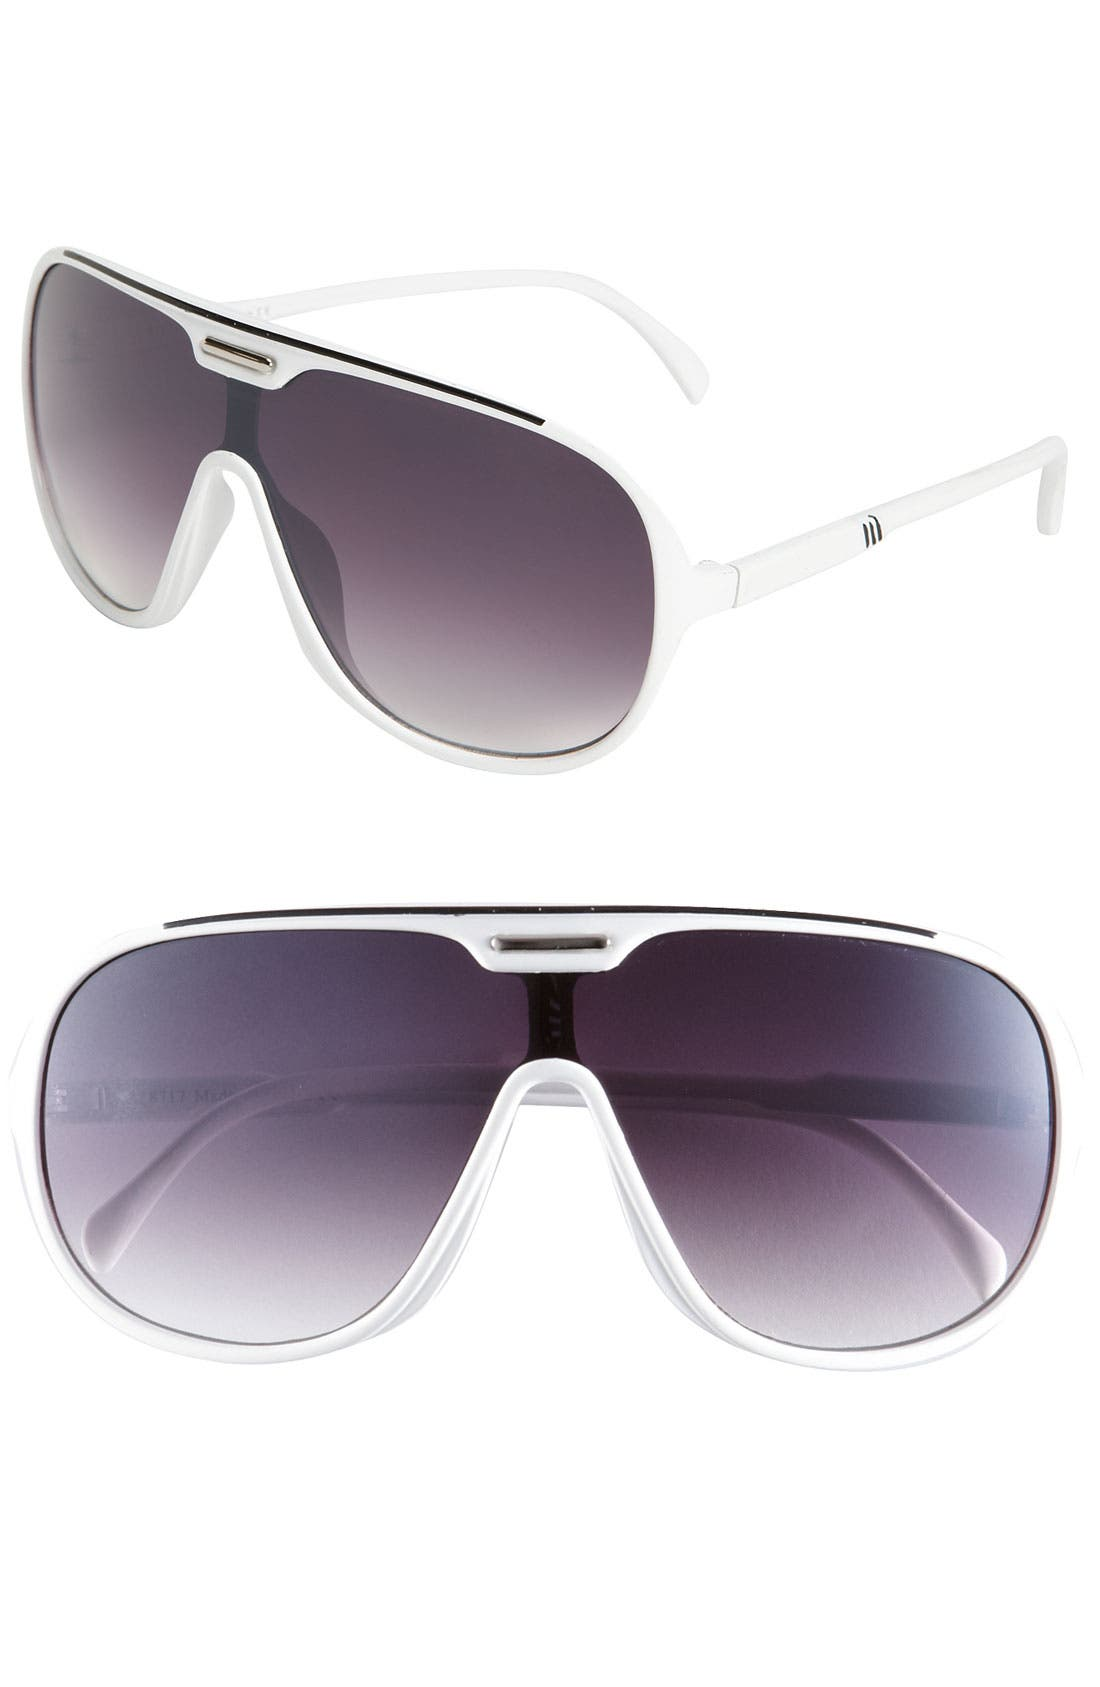 Alternate Image 1 Selected - KW 'Viper' Aviator Sunglasses